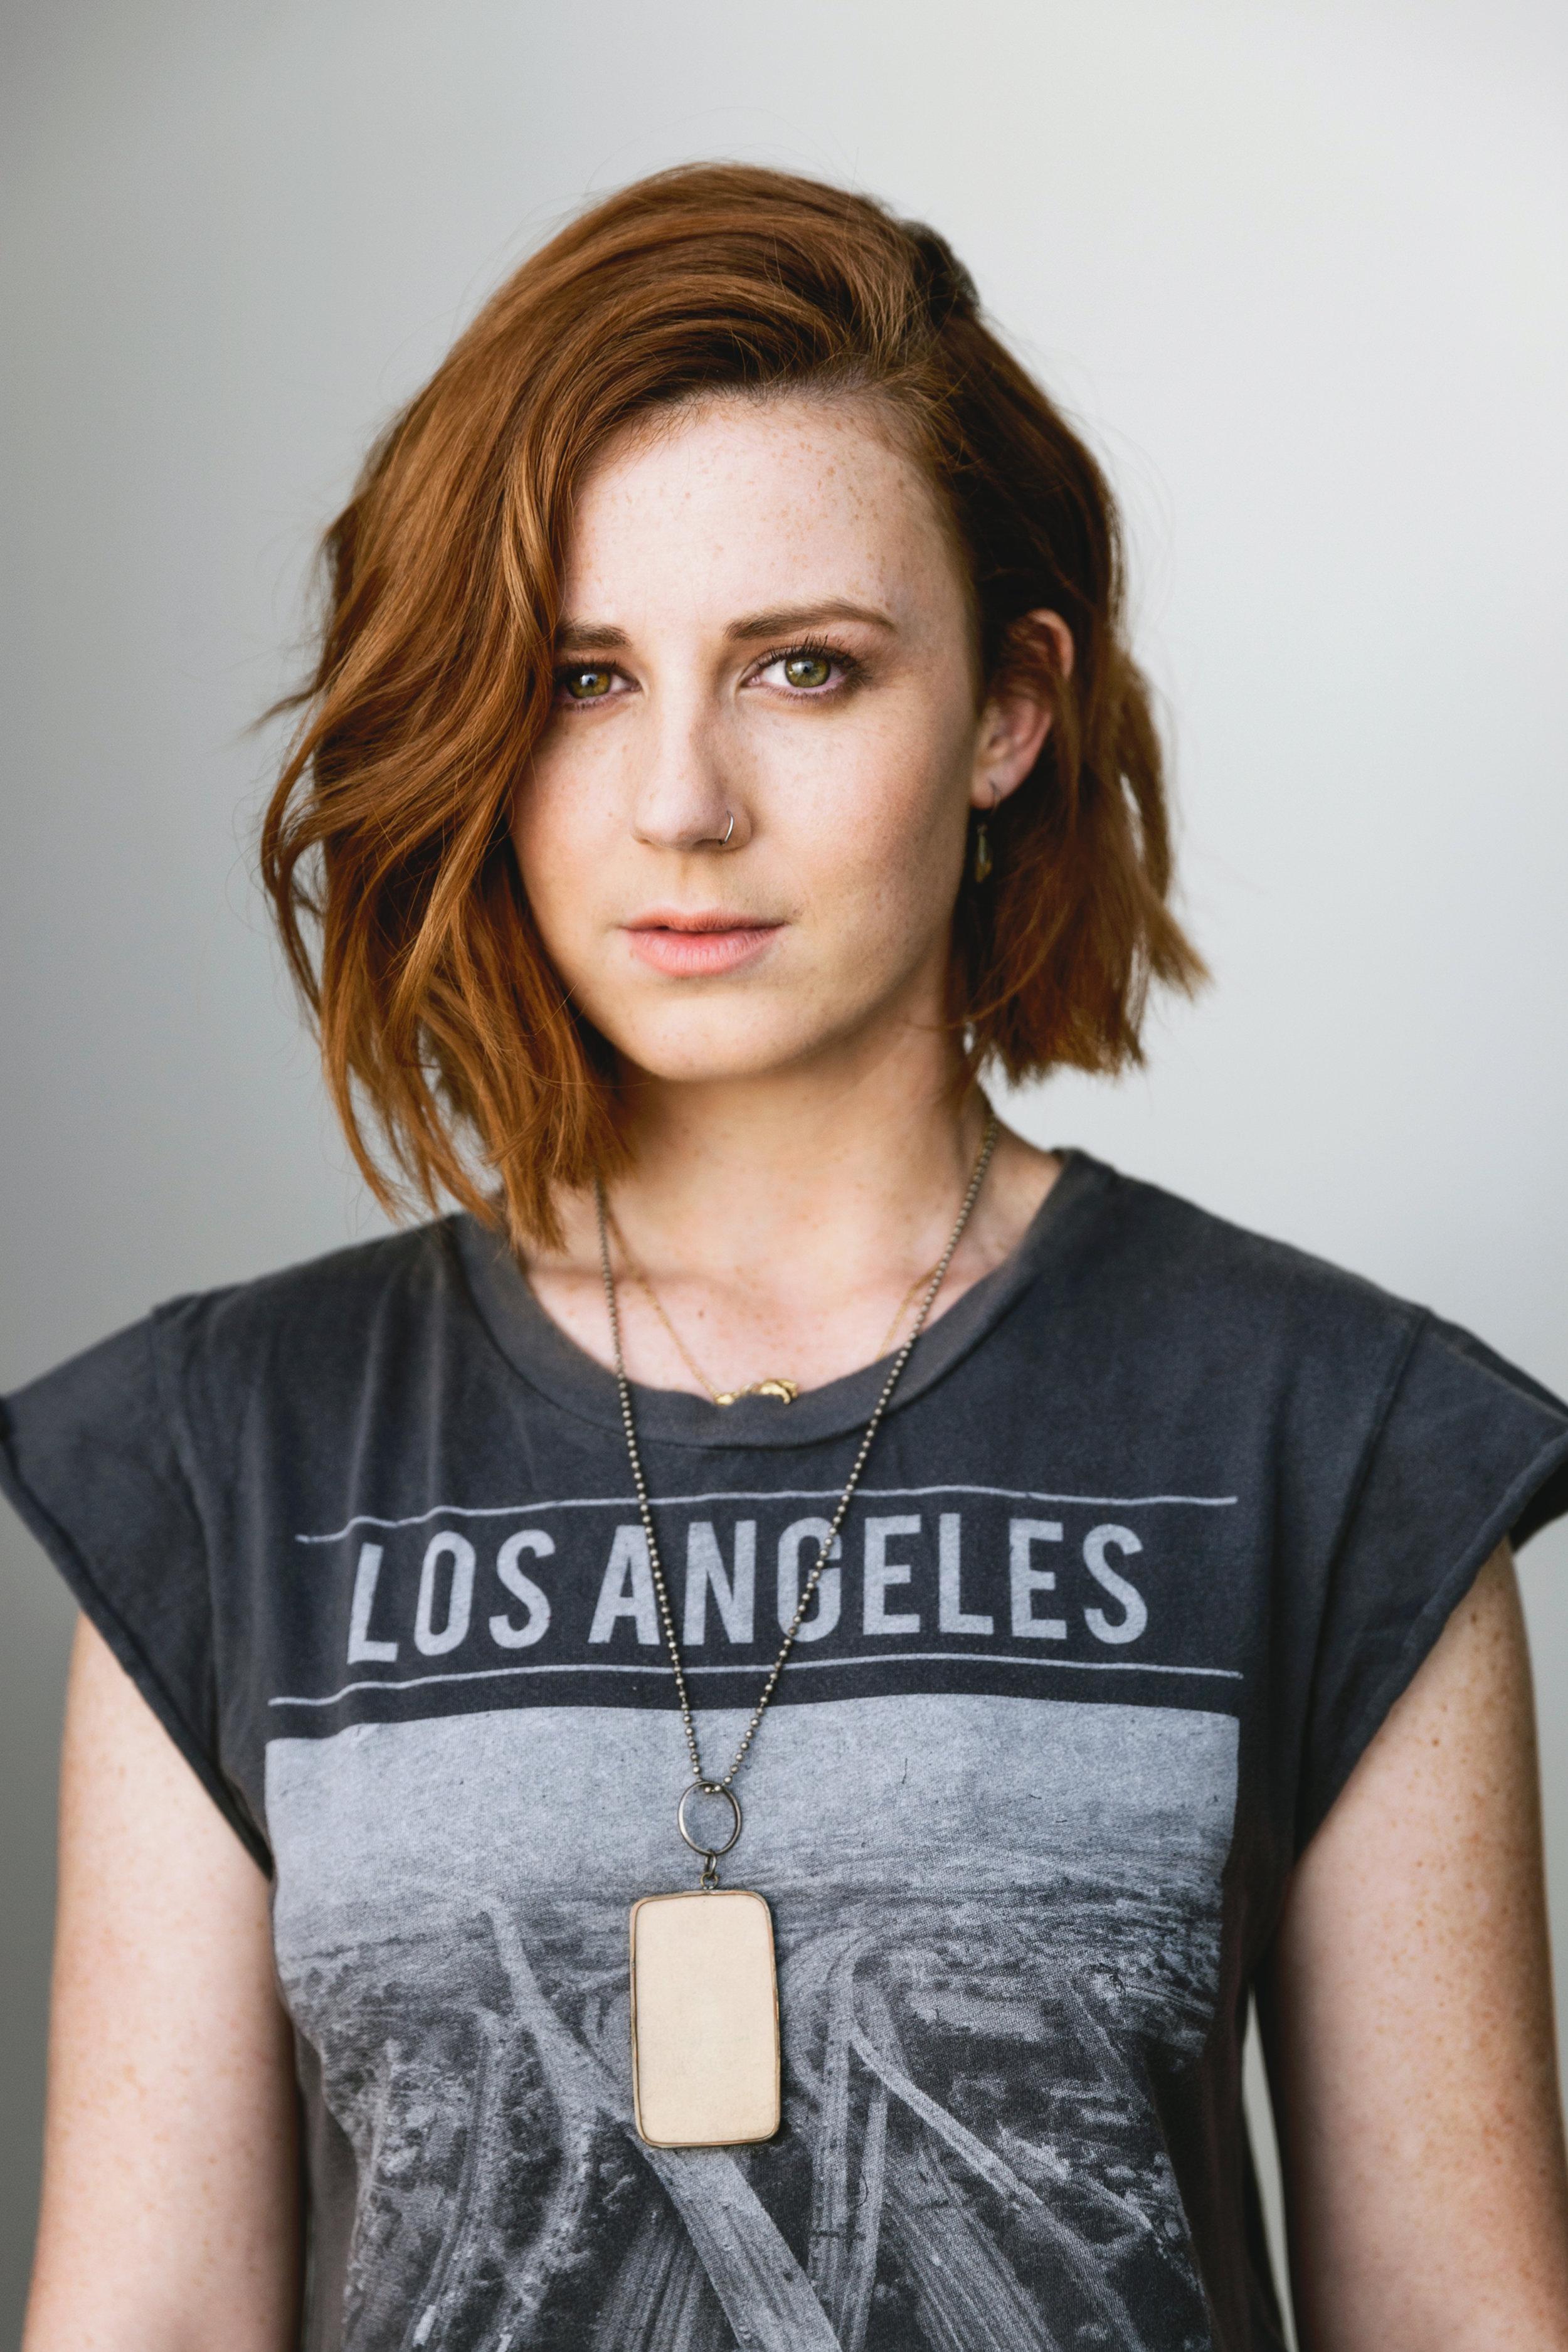 Los Angeles Headshot.jpg